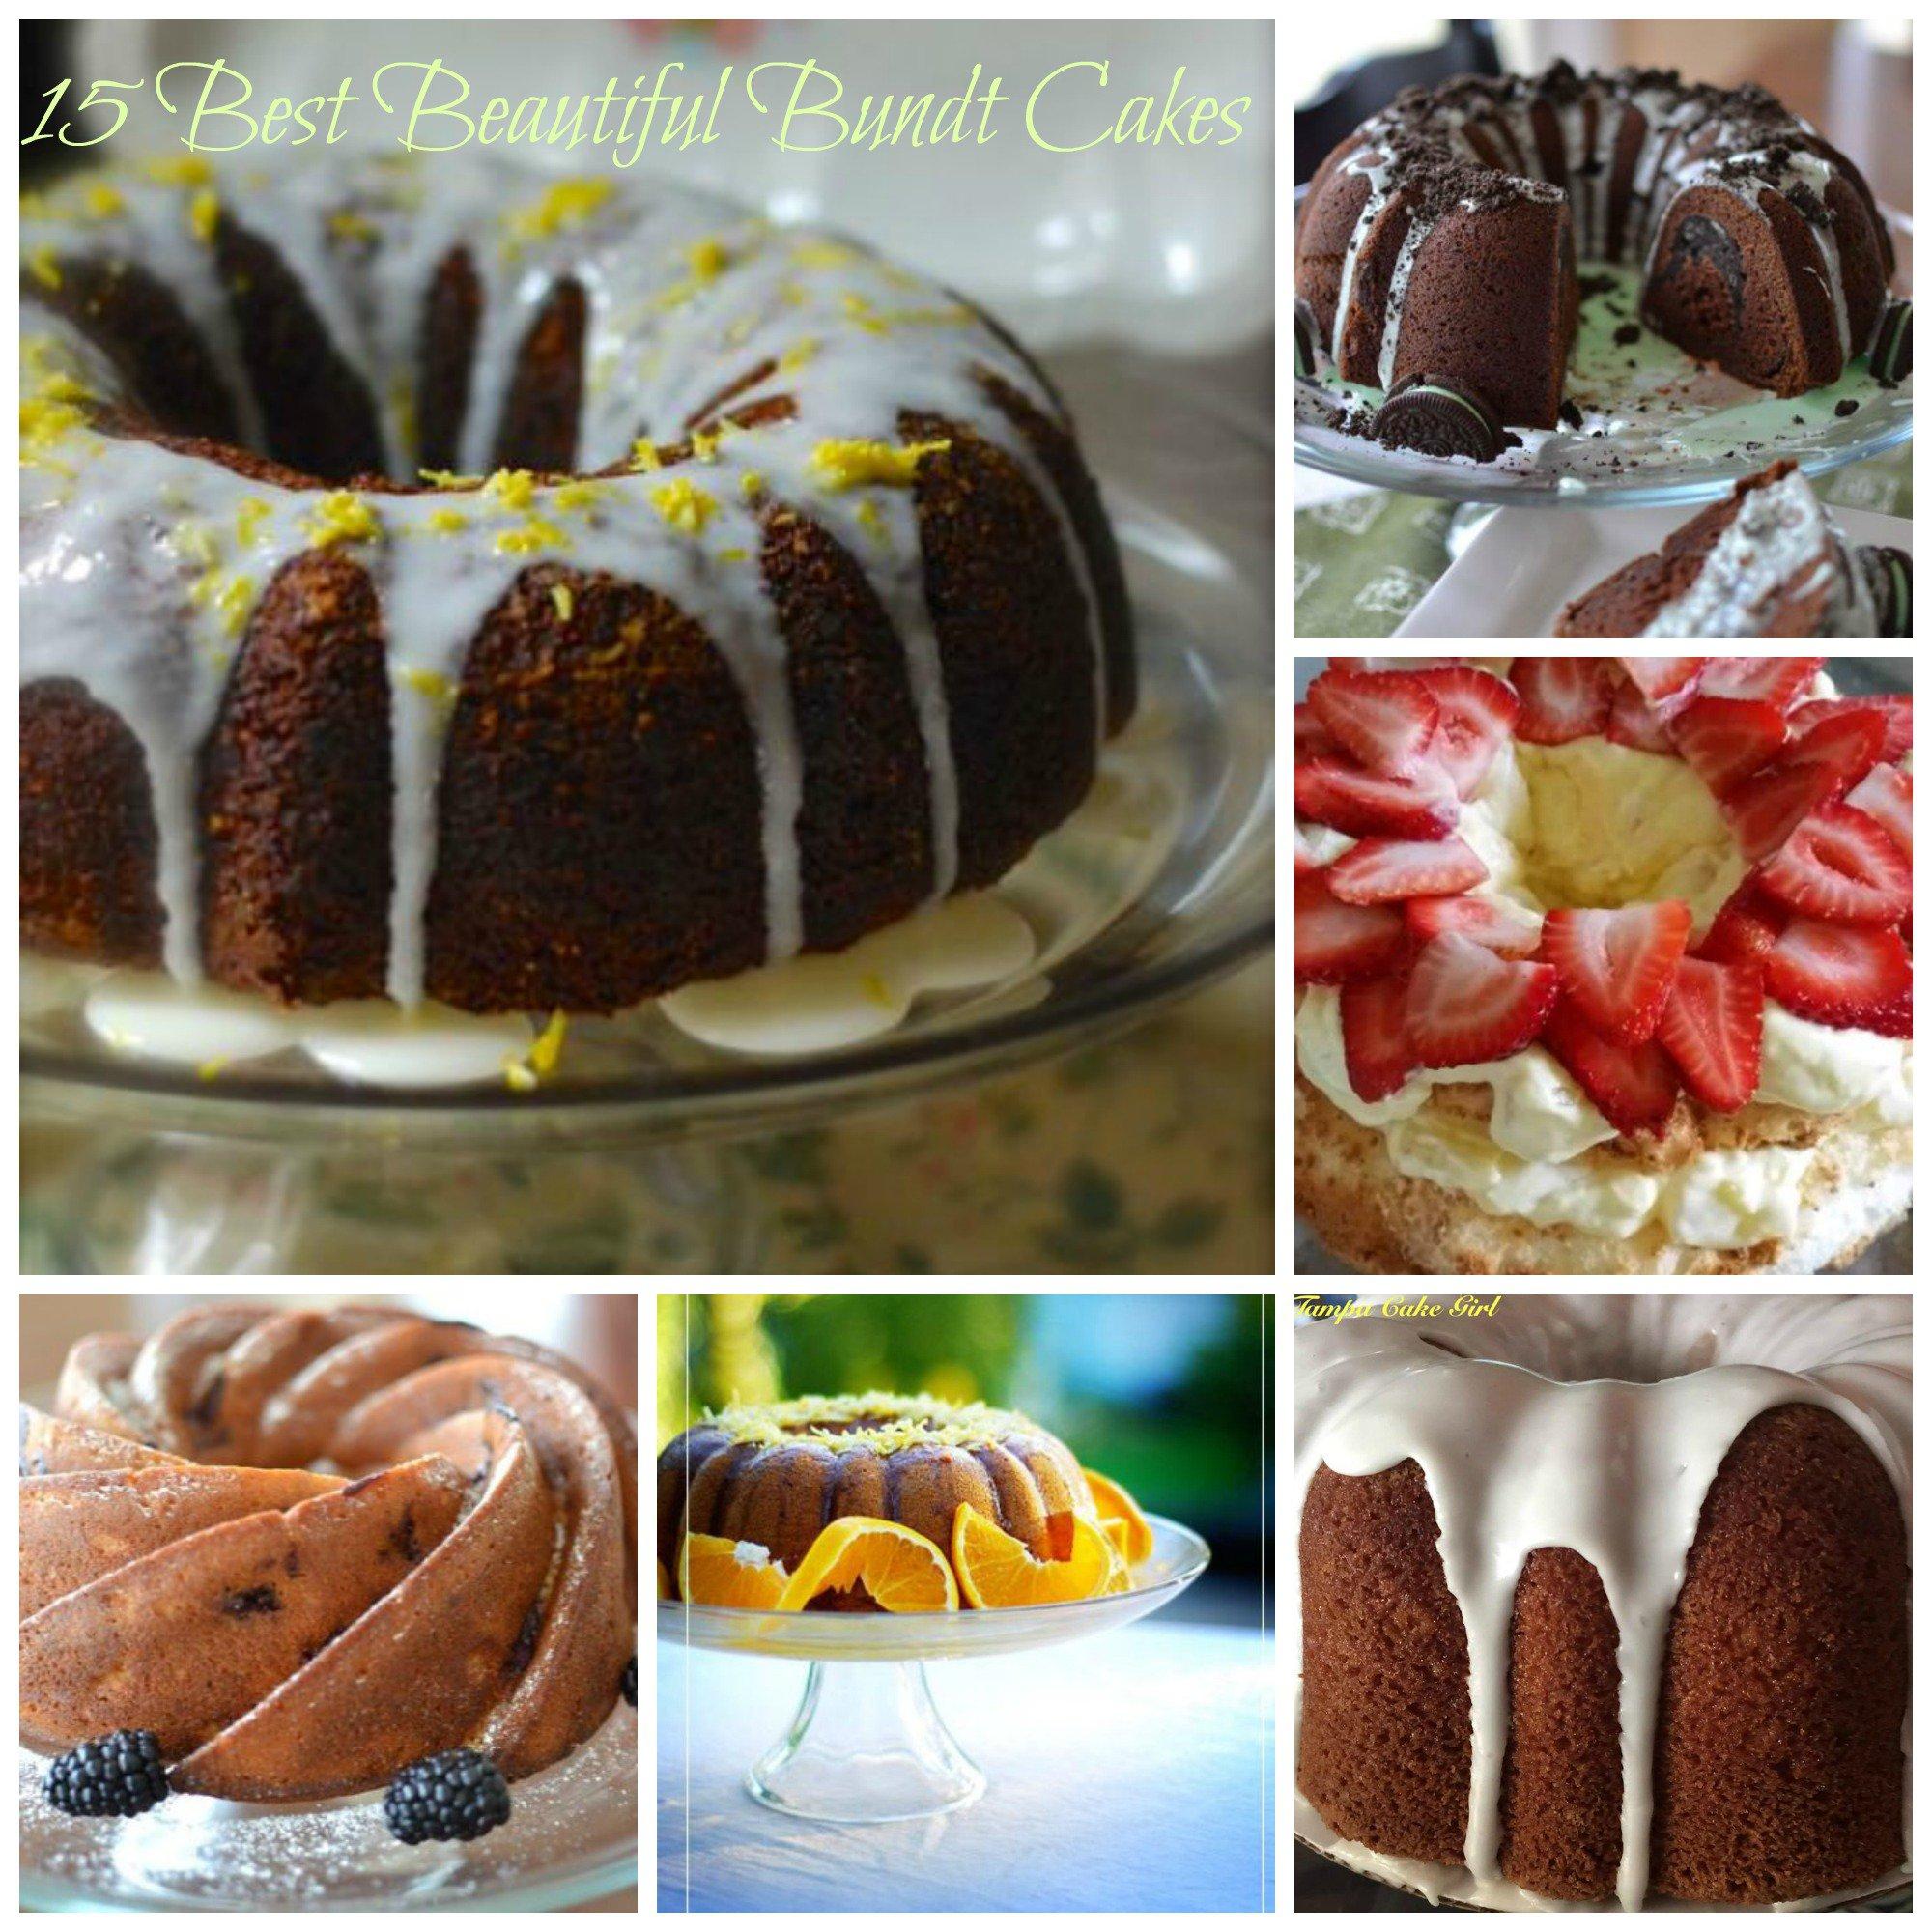 15 Sensational Bundt Cakes